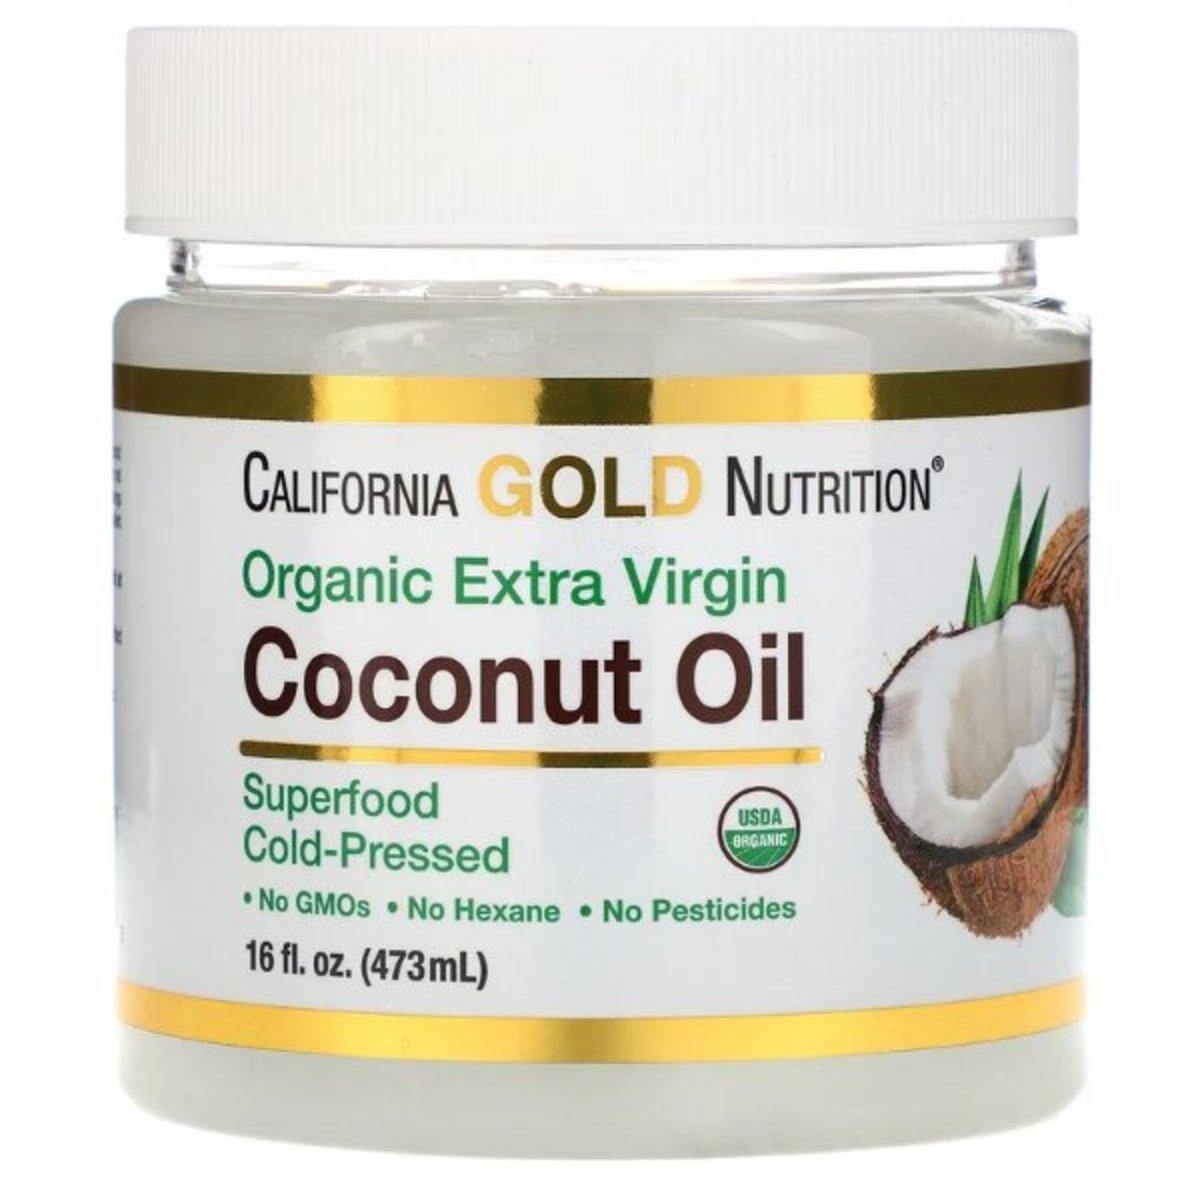 California Gold Nutrition - 冷榨有機初榨椰子油 473ml HK$155